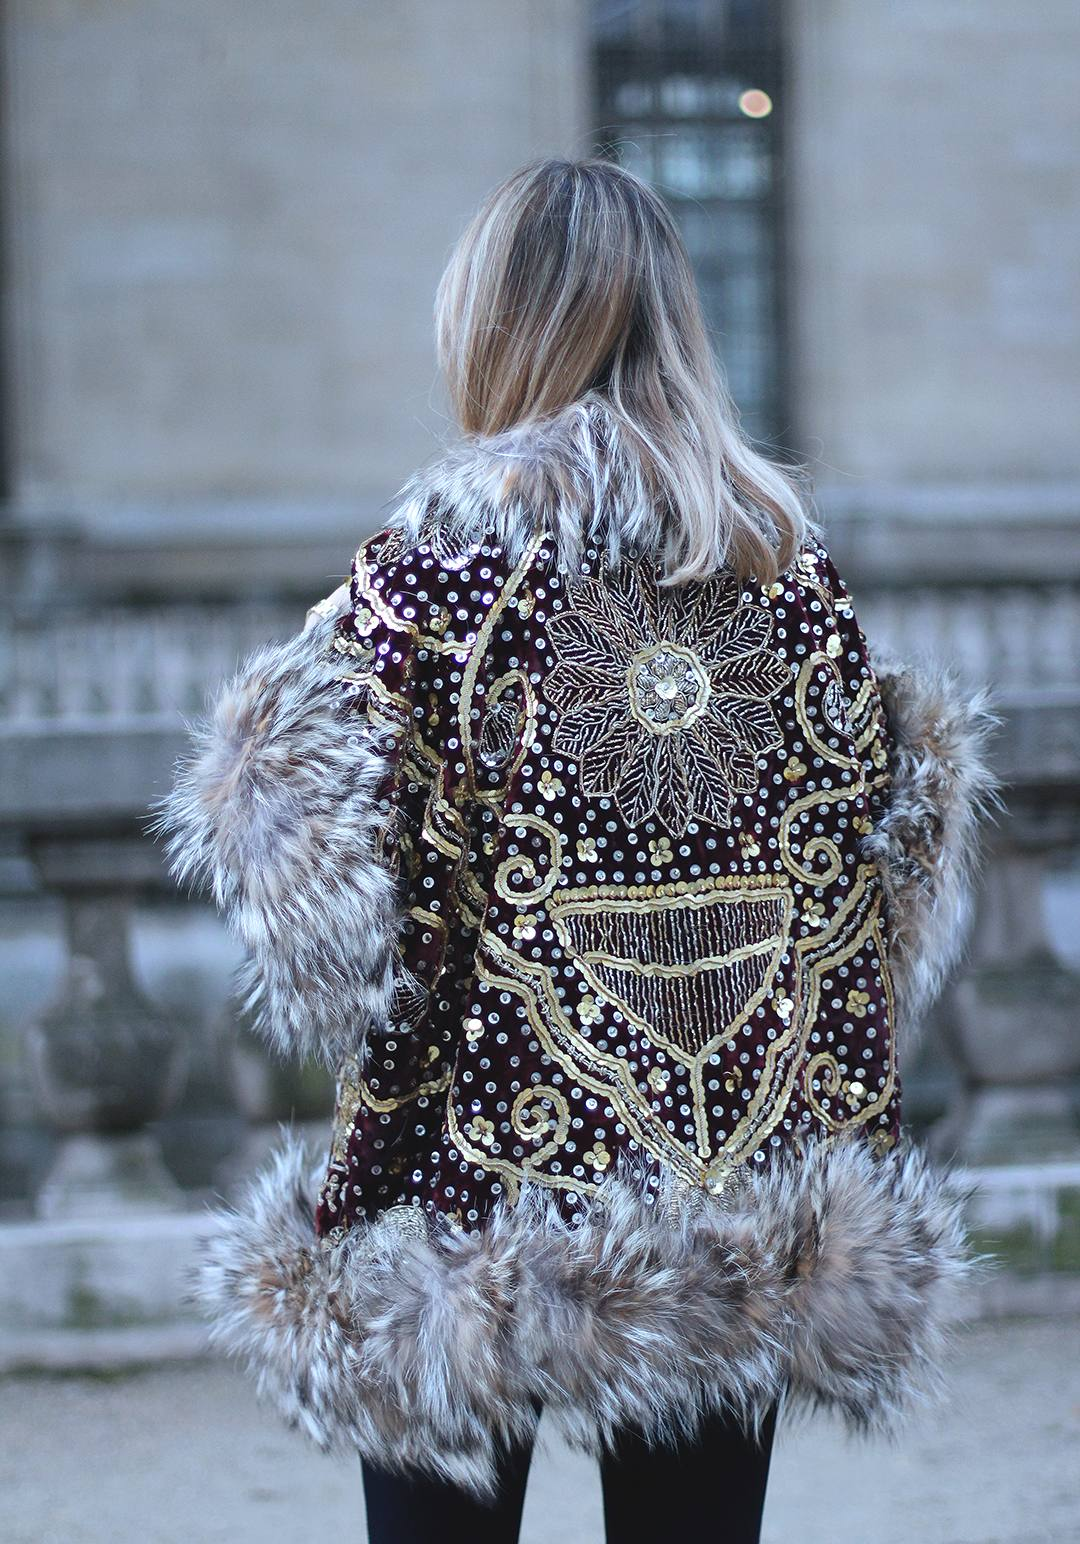 tete-by-odette-paris-fashion-week-mes-voyages-a-paris-street-style